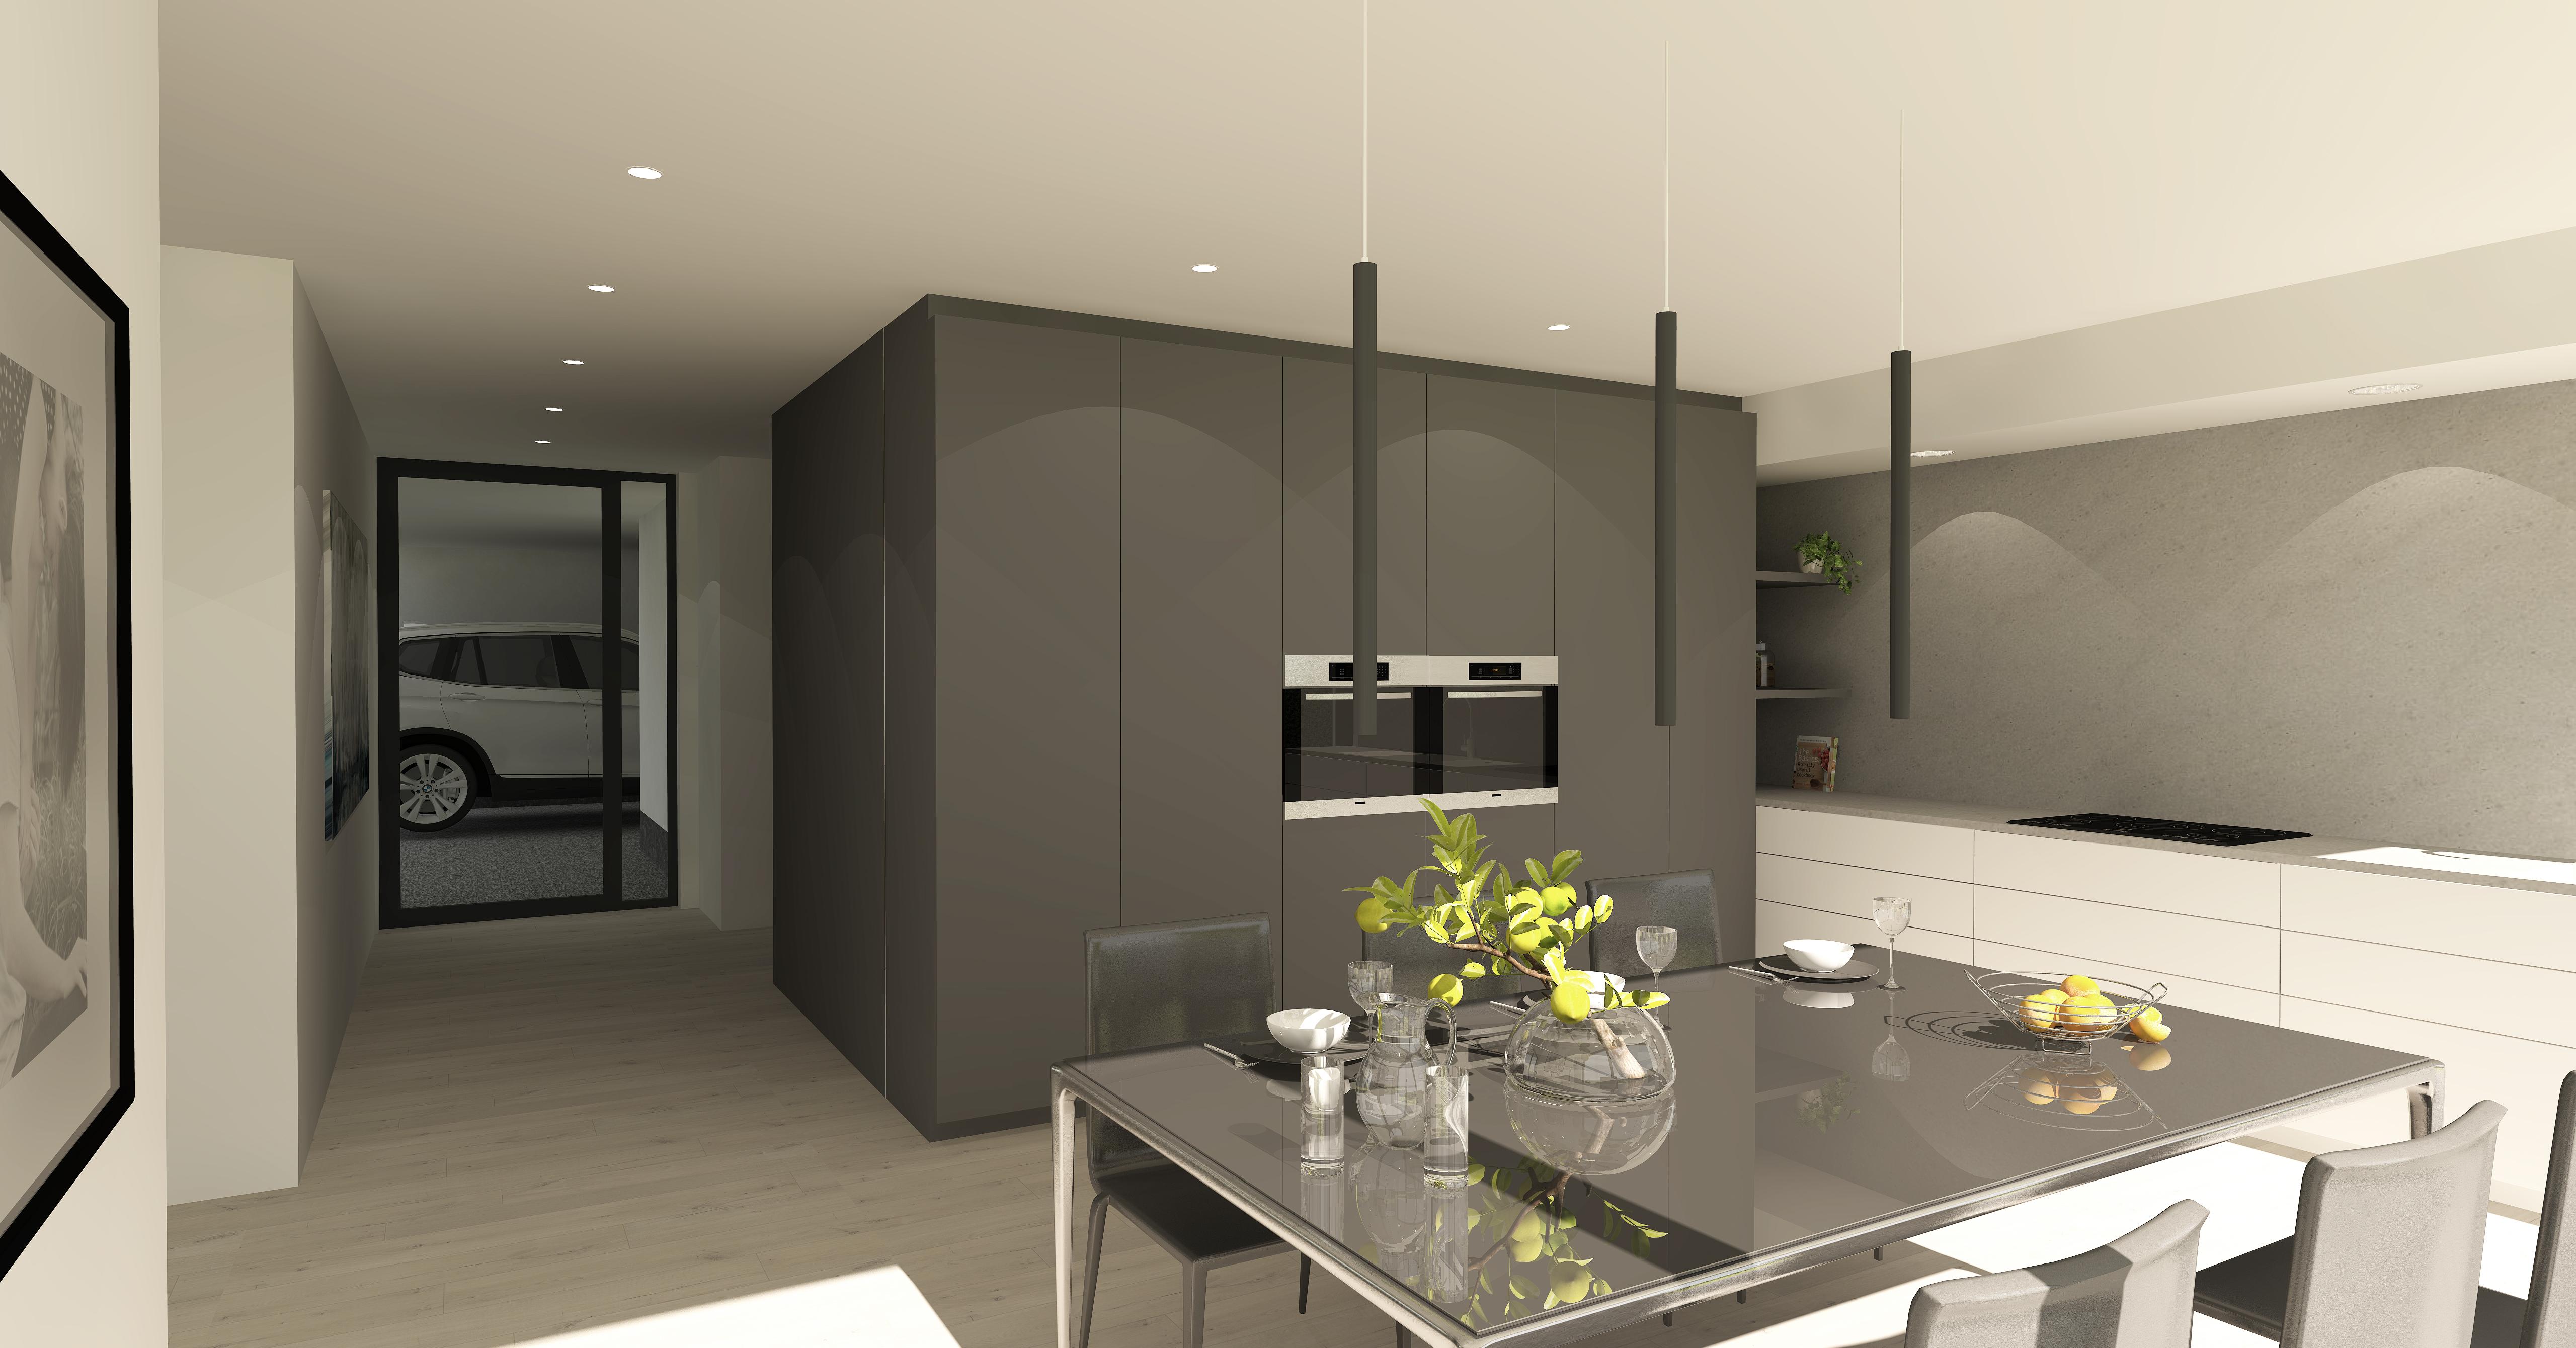 9. Keuken